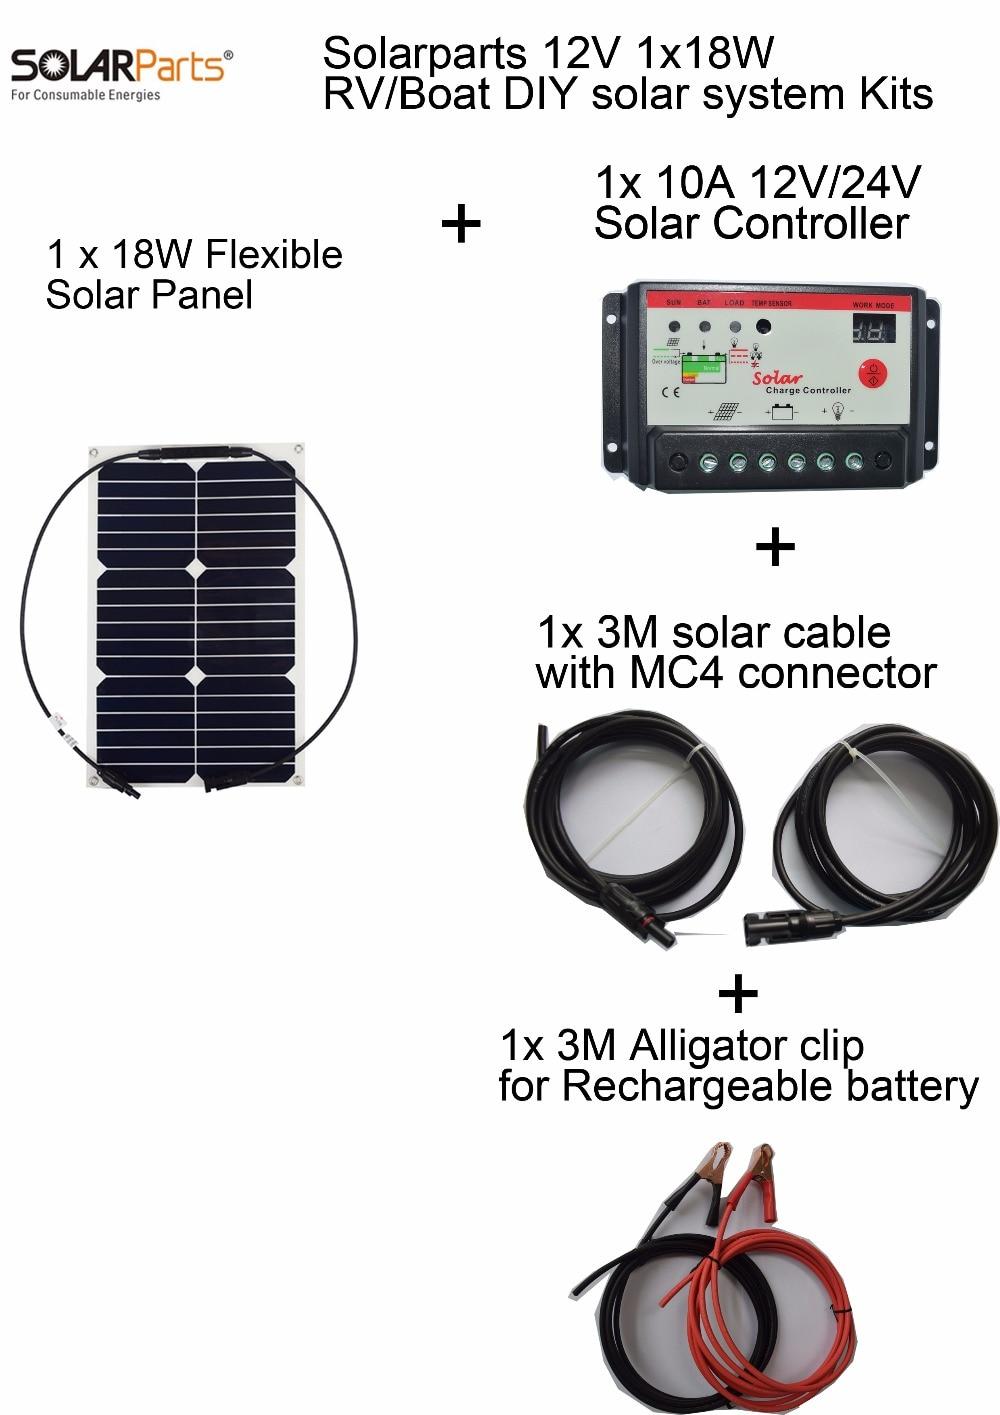 все цены на Solarpart 12V 1x18W DIY RV Boat Kits Solar System 18W flexible solar panel 1x 10A solar controller 1 set 3M MC4 cable 1 set clip онлайн